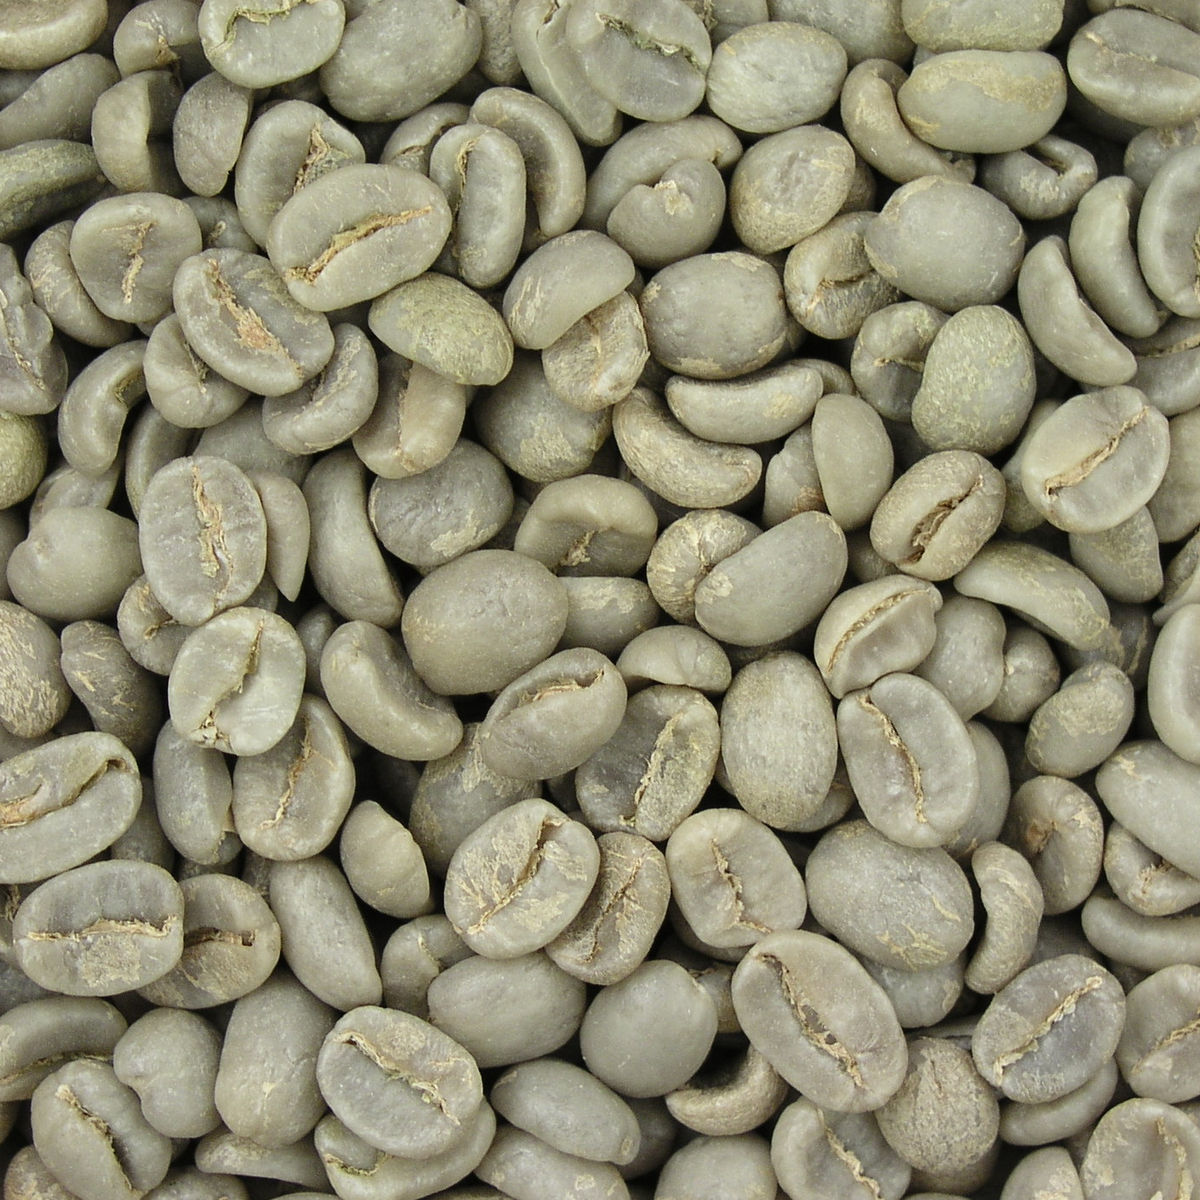 10 uker greencoffeebeans